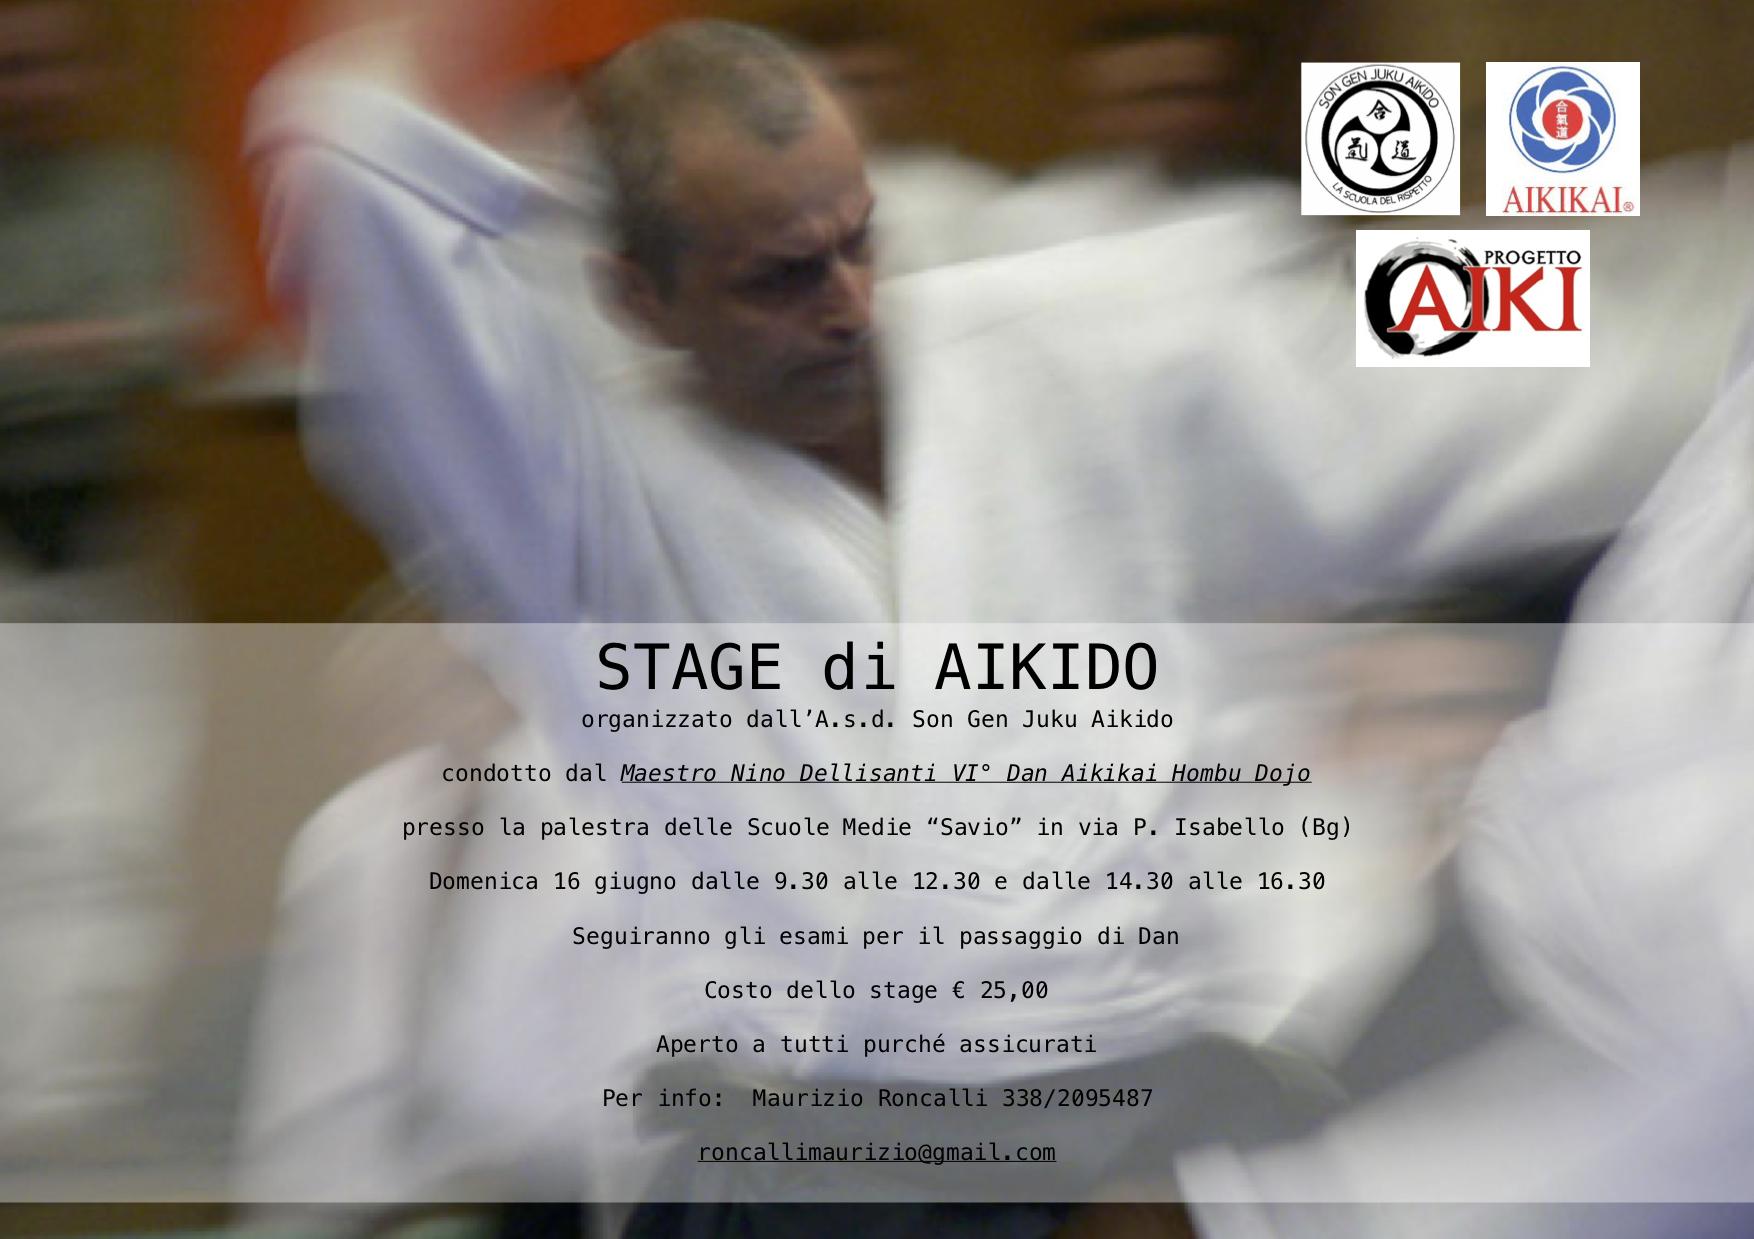 Stage di Aikido, Son Gen Juku Aikido, Nino Dellisanti, ProgettoAIki, Bergamo